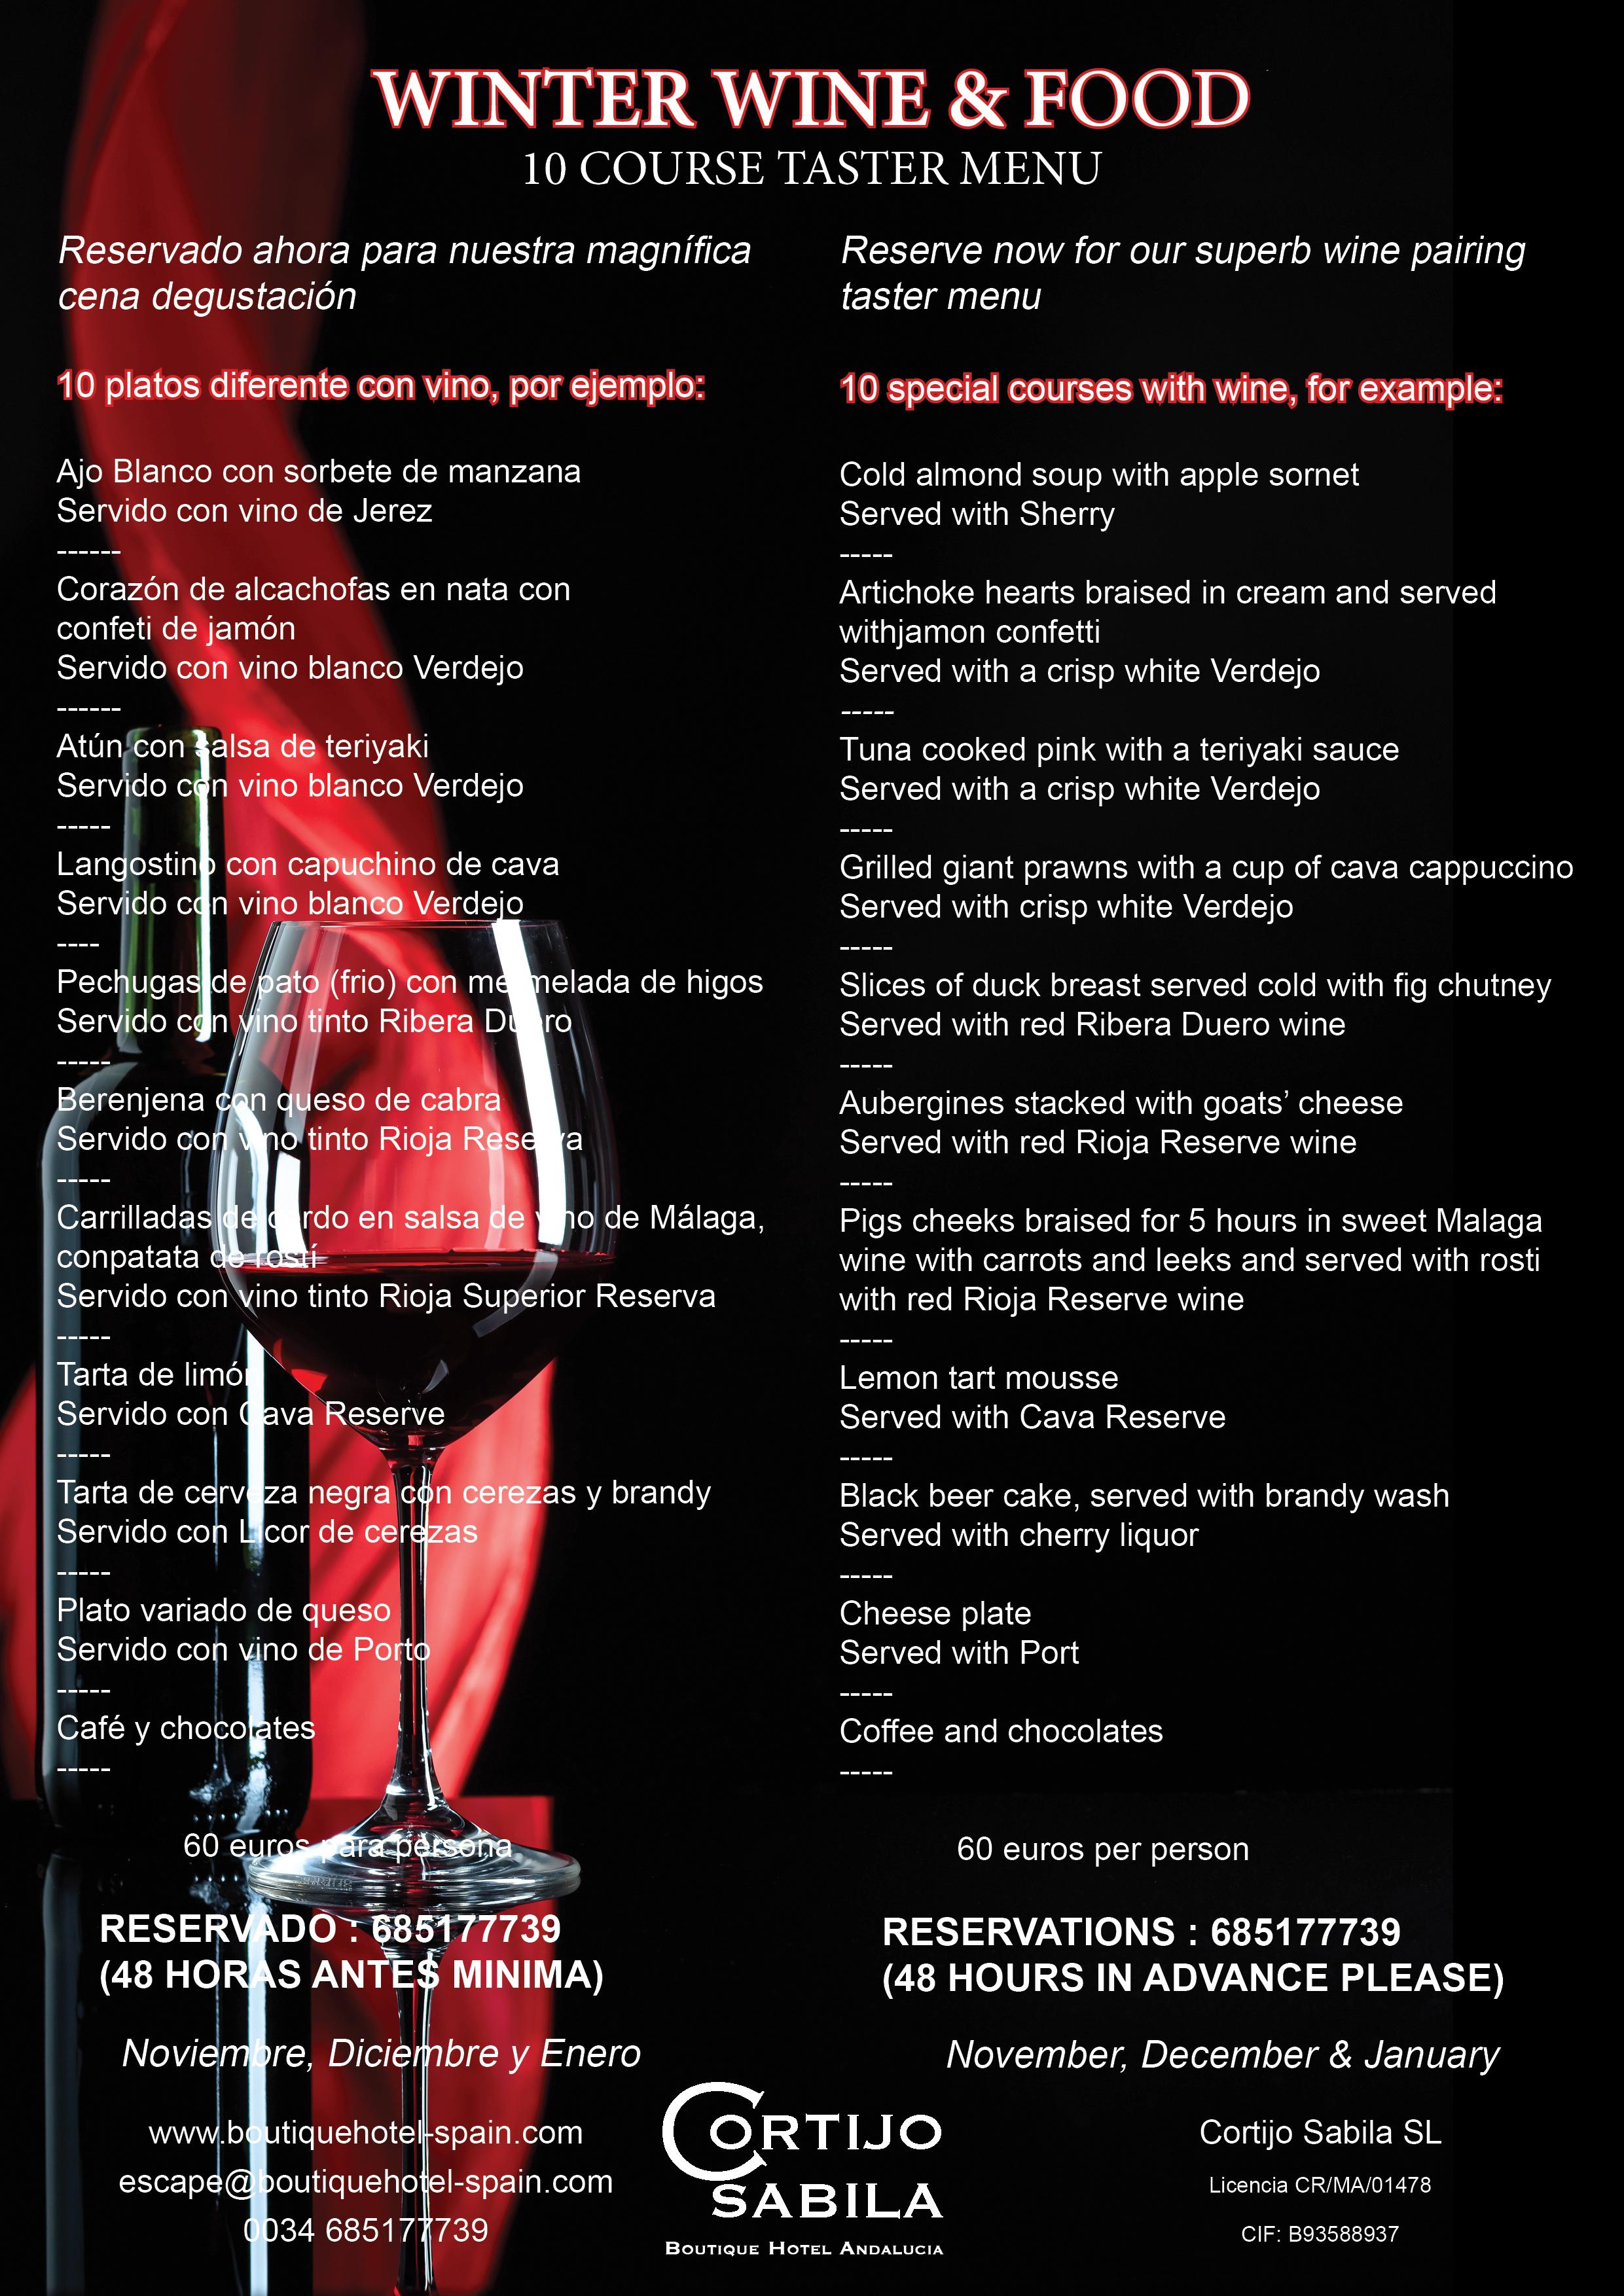 10 course tasting menu